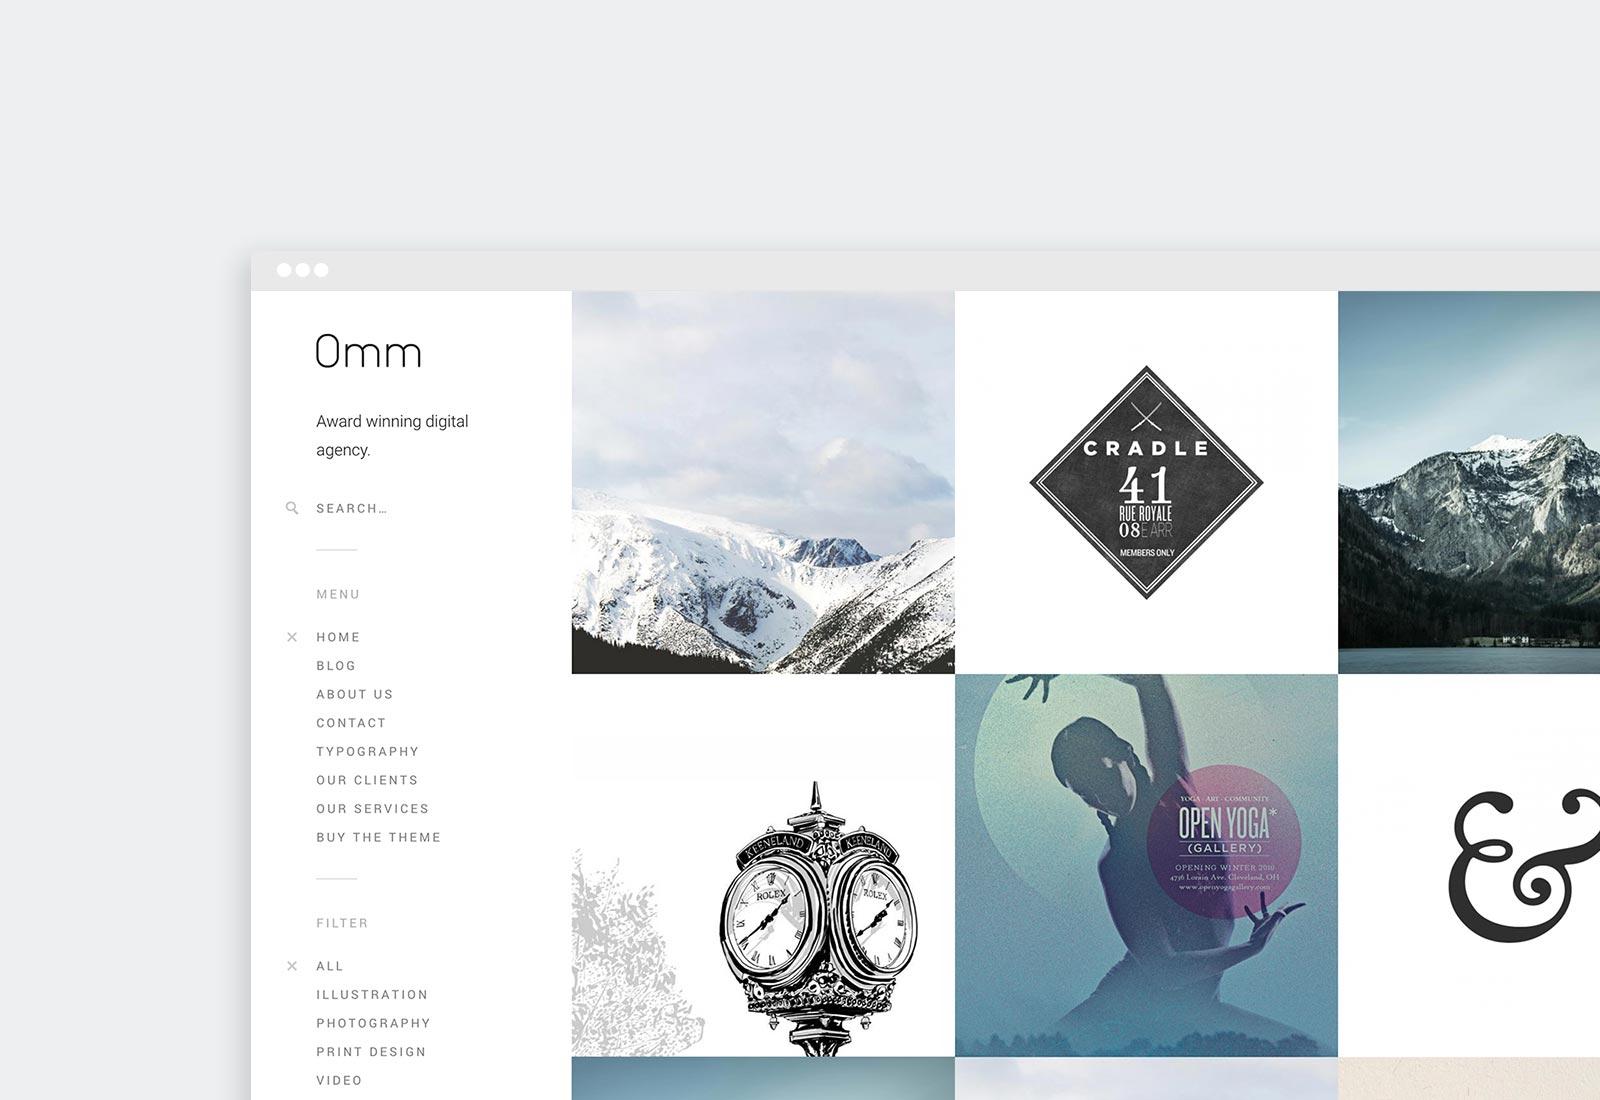 Omm WordPress Theme